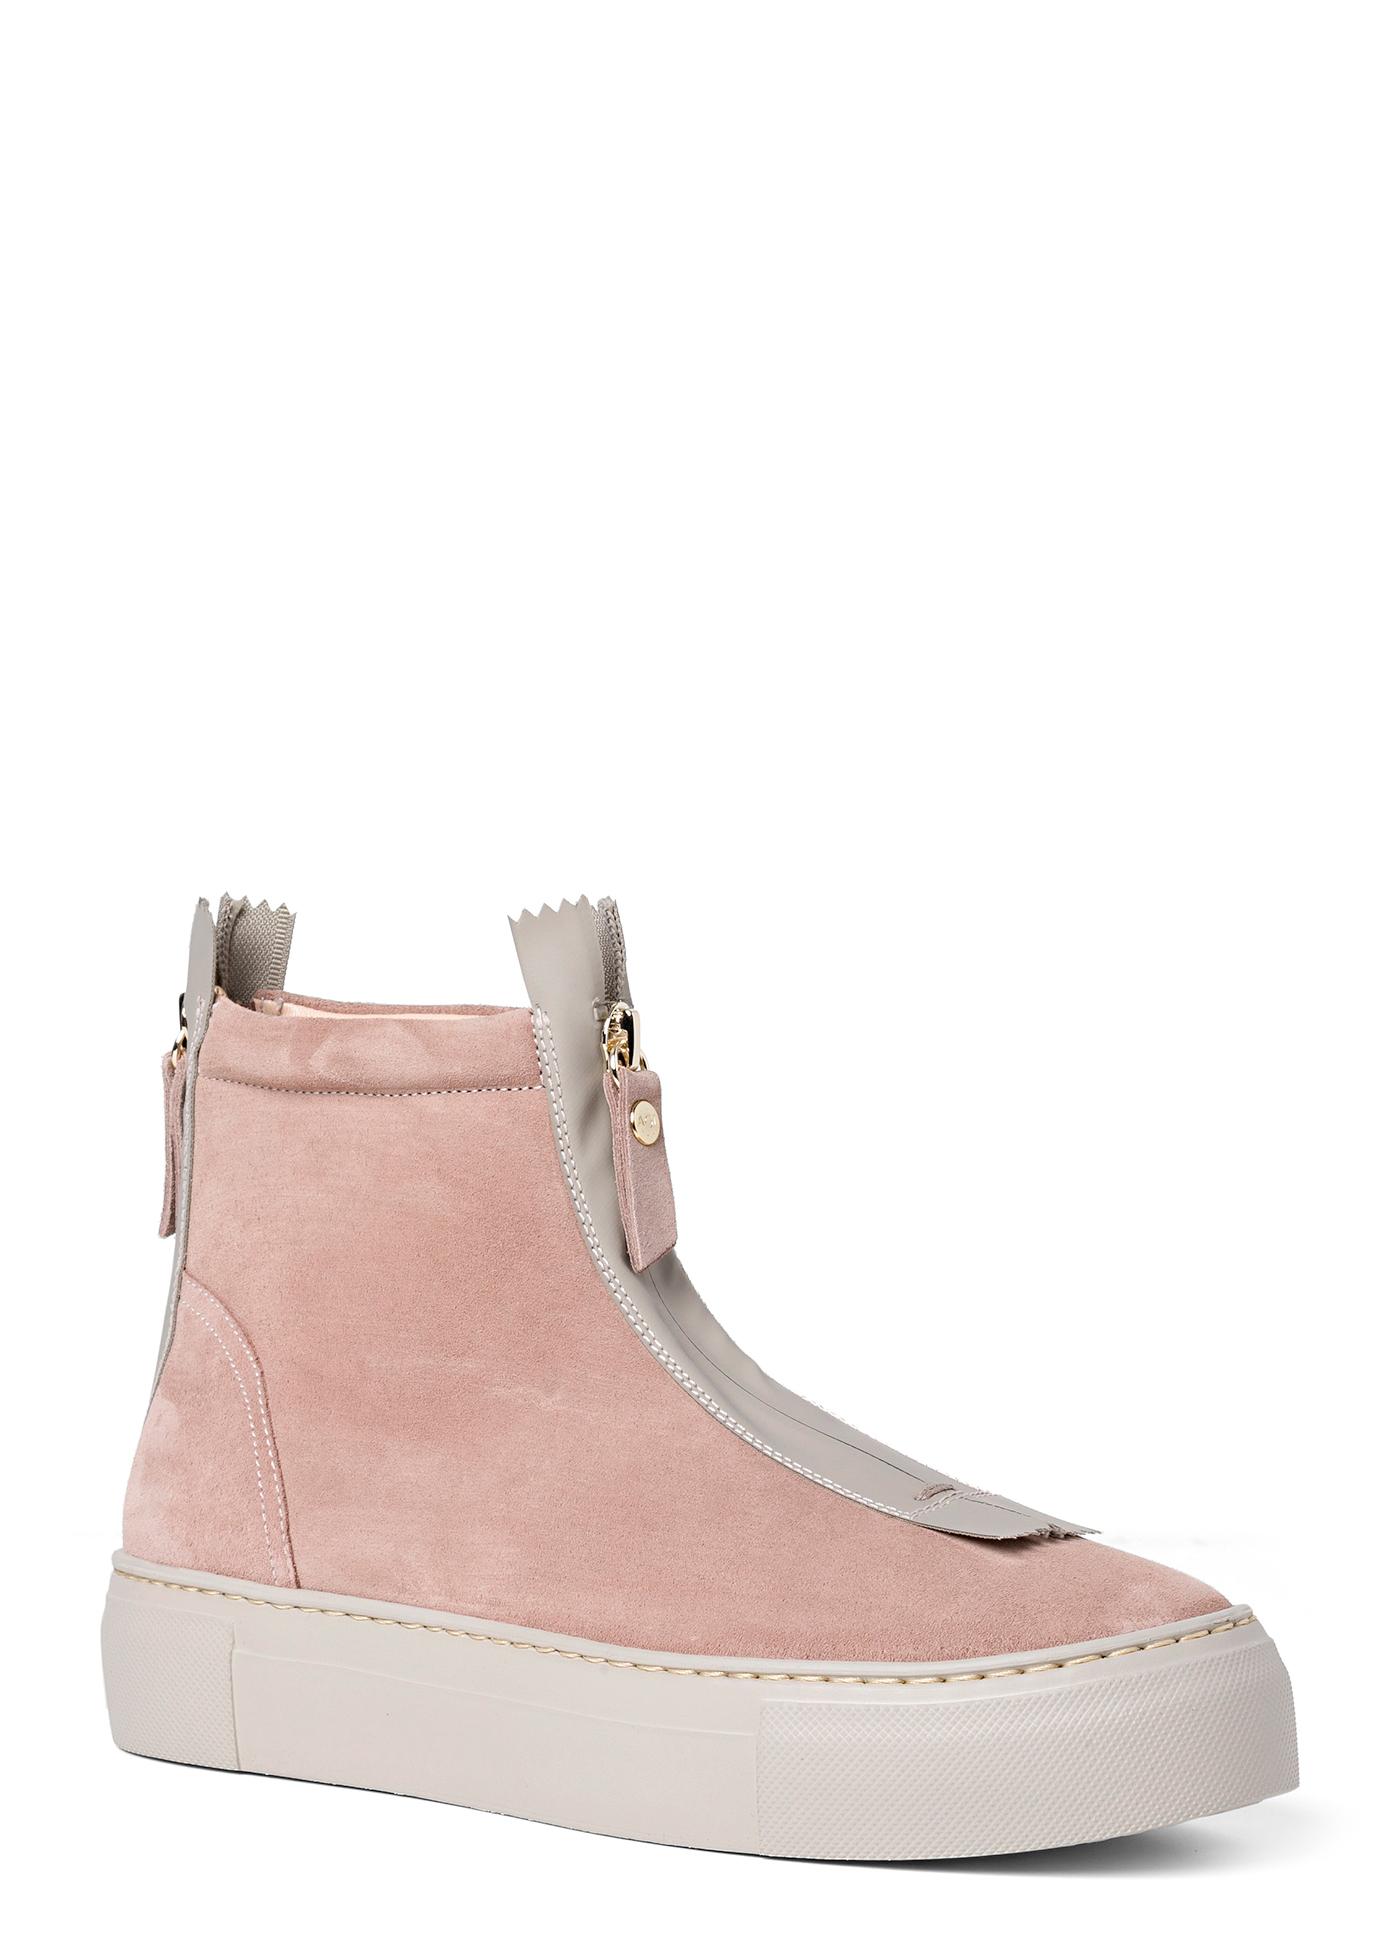 MAEVA Sneaker Boot image number 1